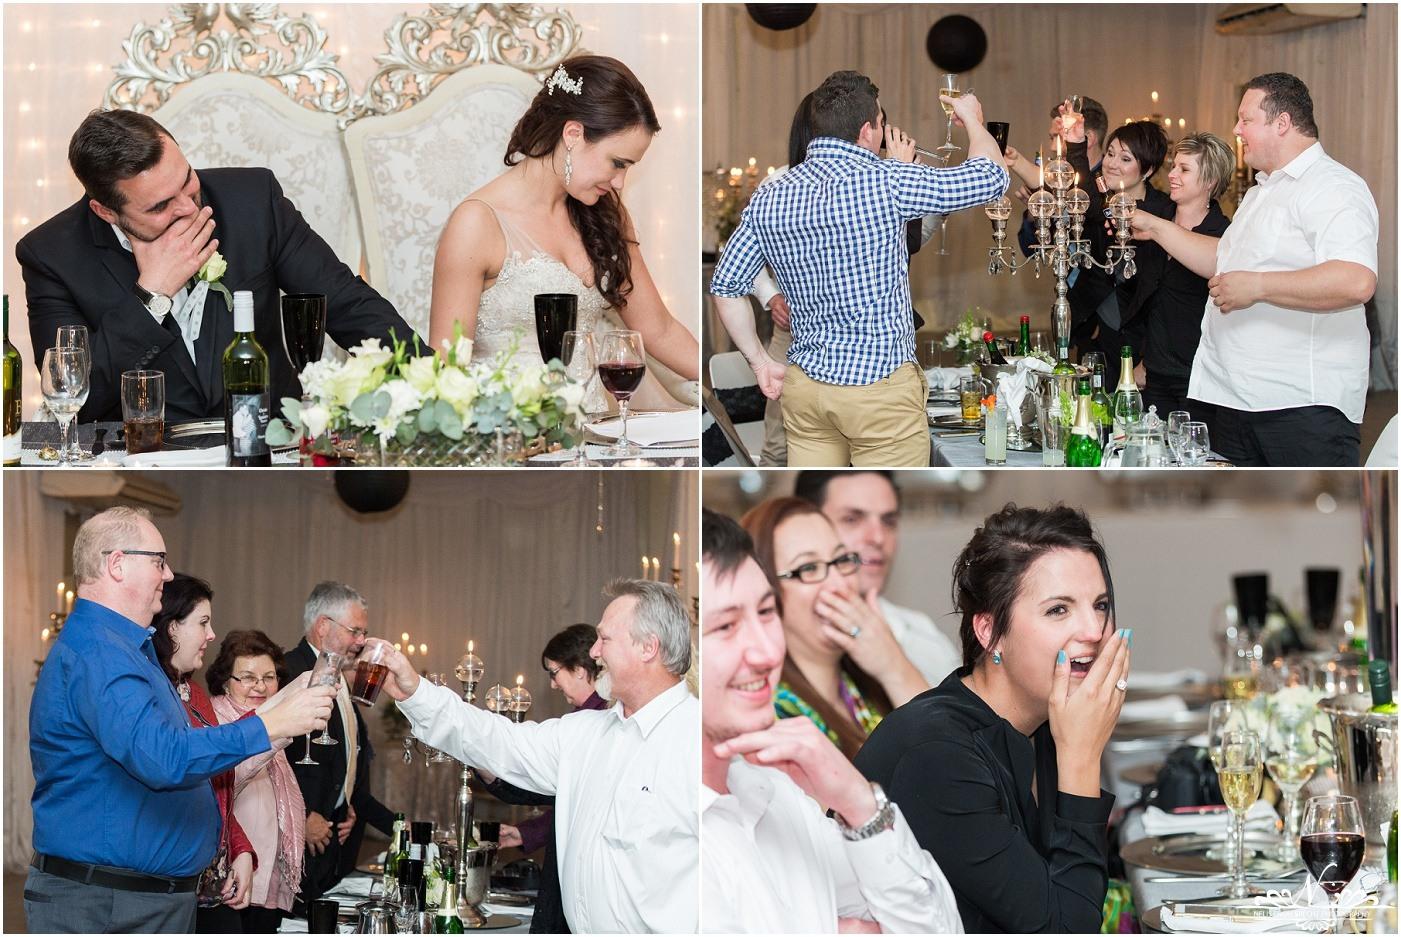 Eensgezind-Wedding-Photos-Nelis-Engelbrecht-Photography-183